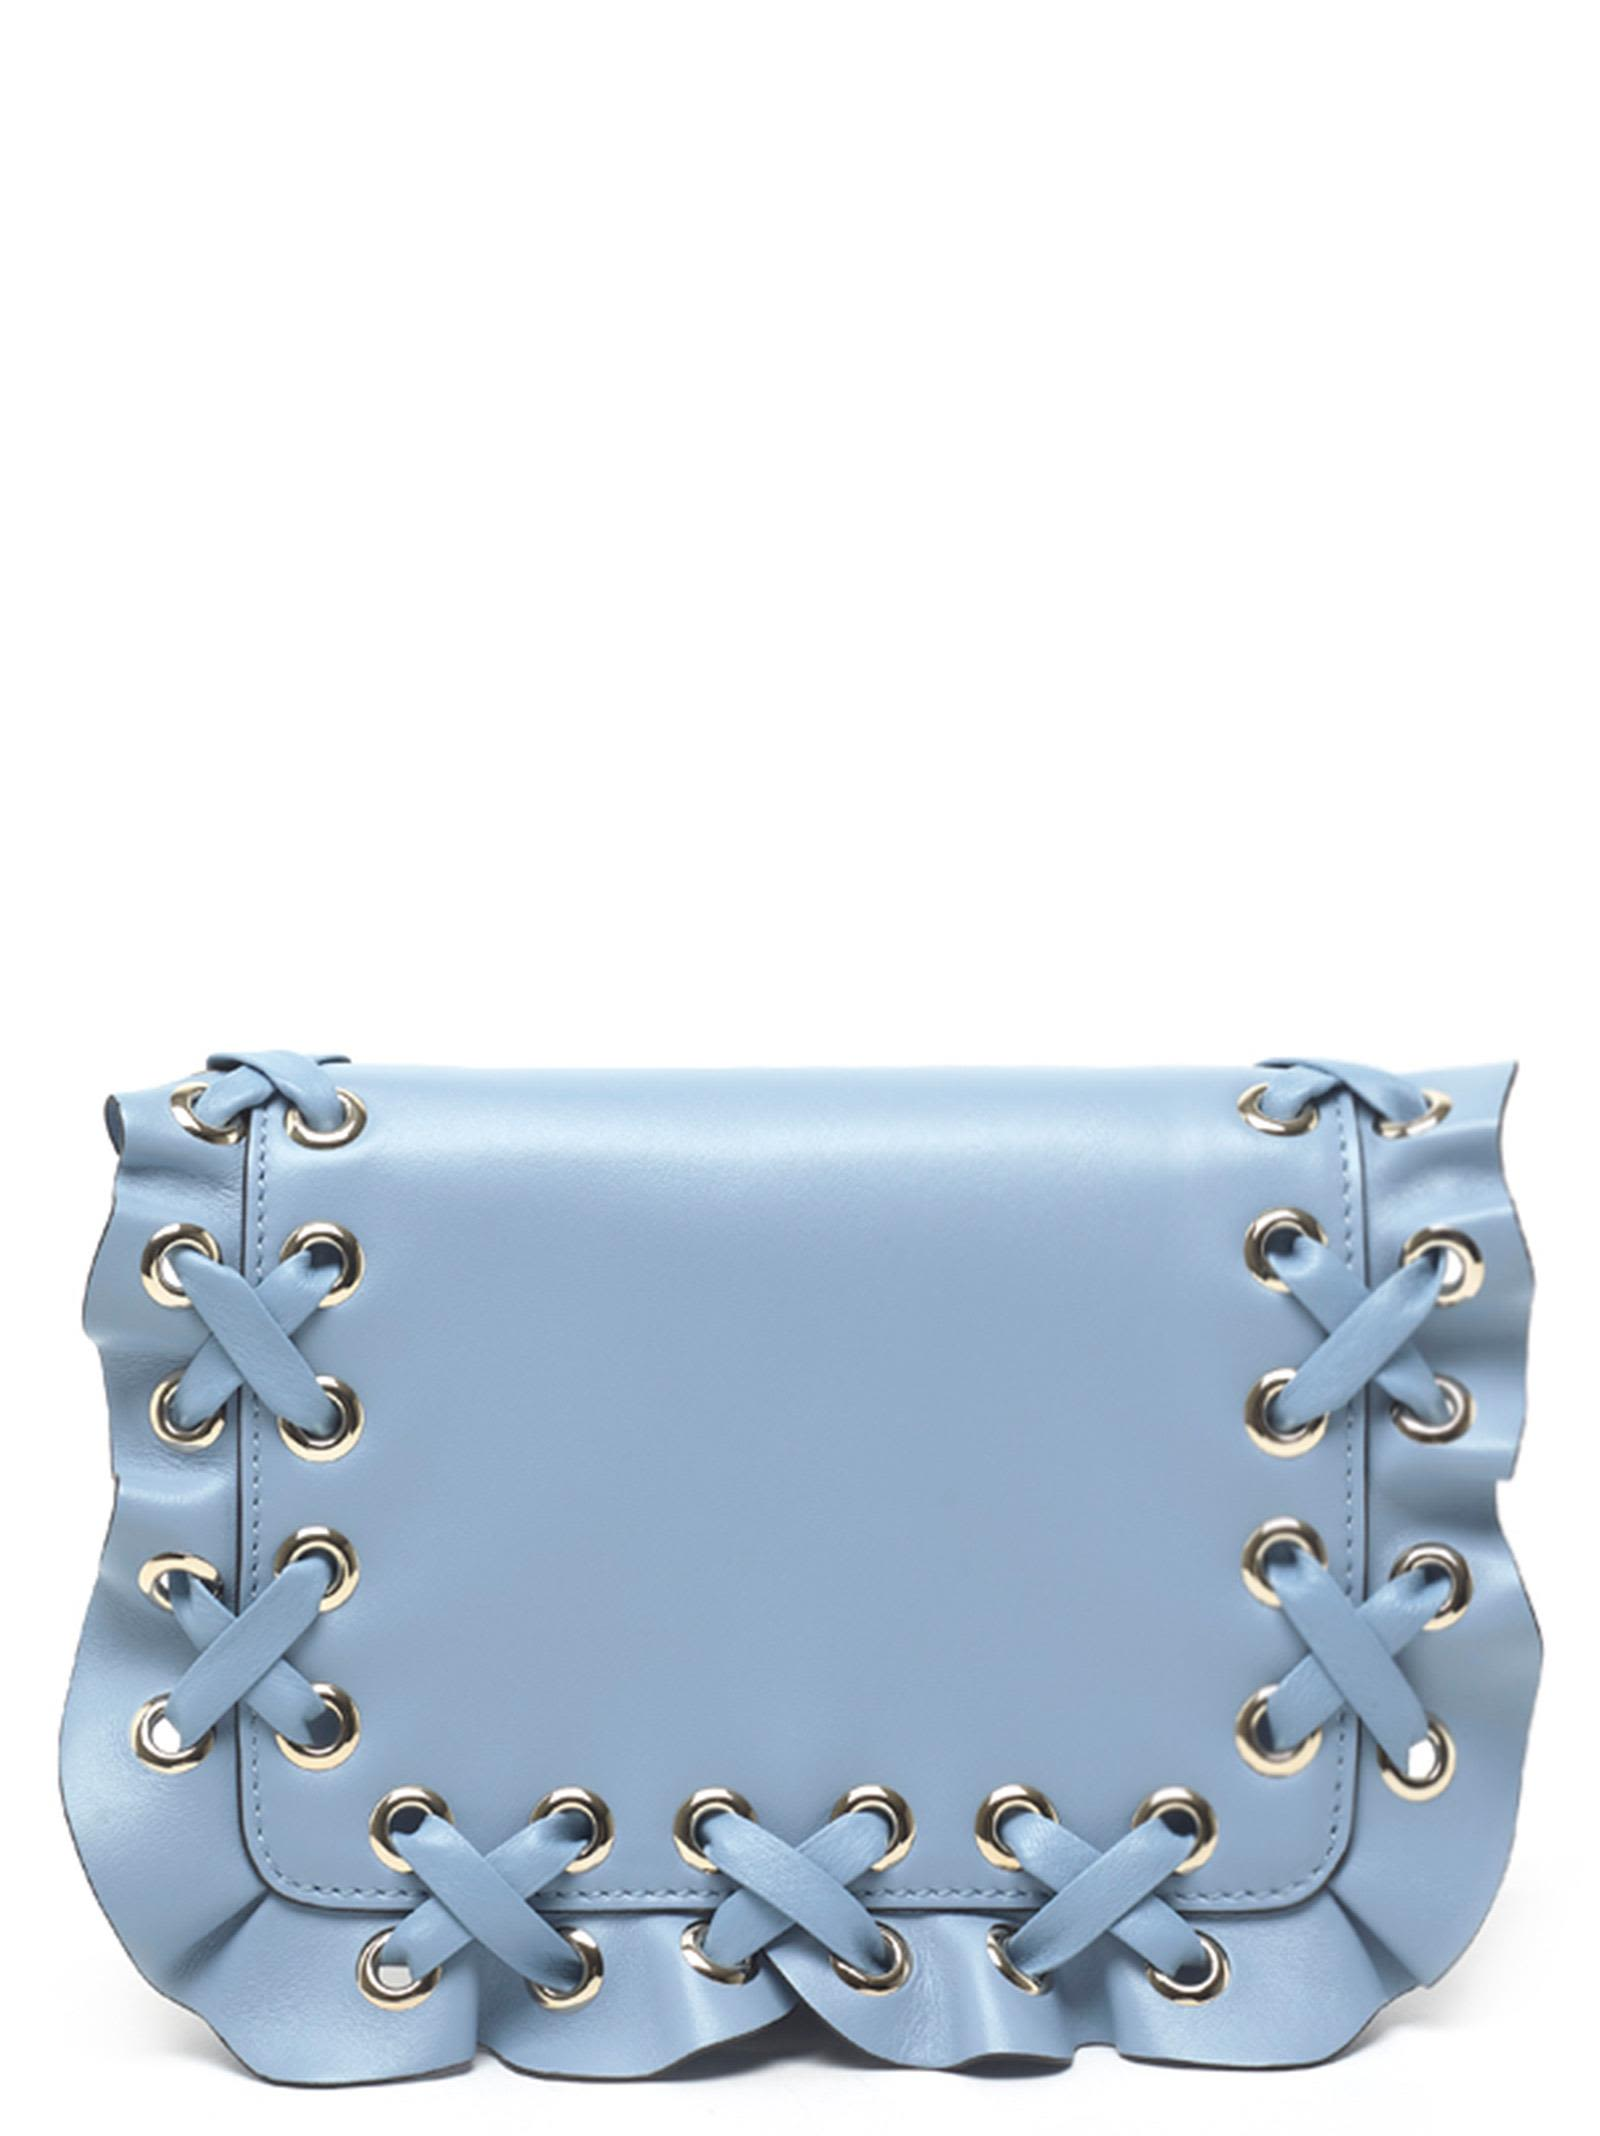 Red Valentino 'Rock Ruffle' Bag, Light Blue